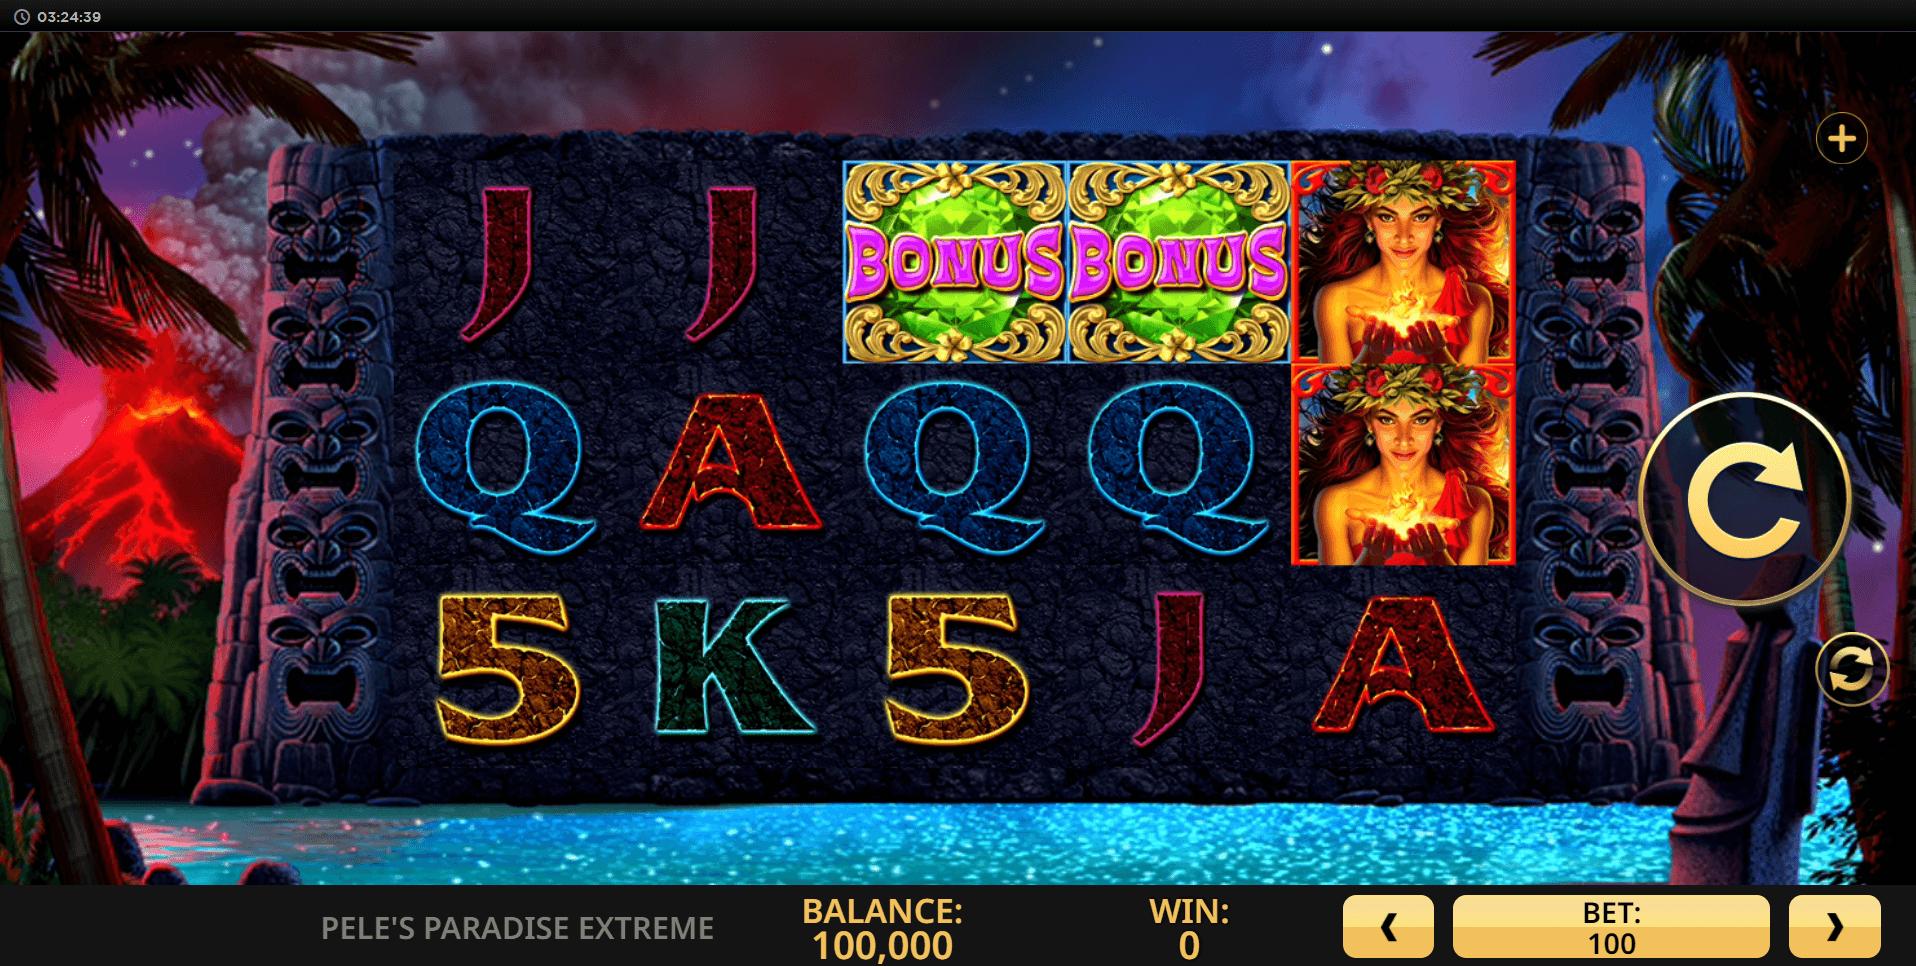 Peles Paradise Extreme slot machine screenshot